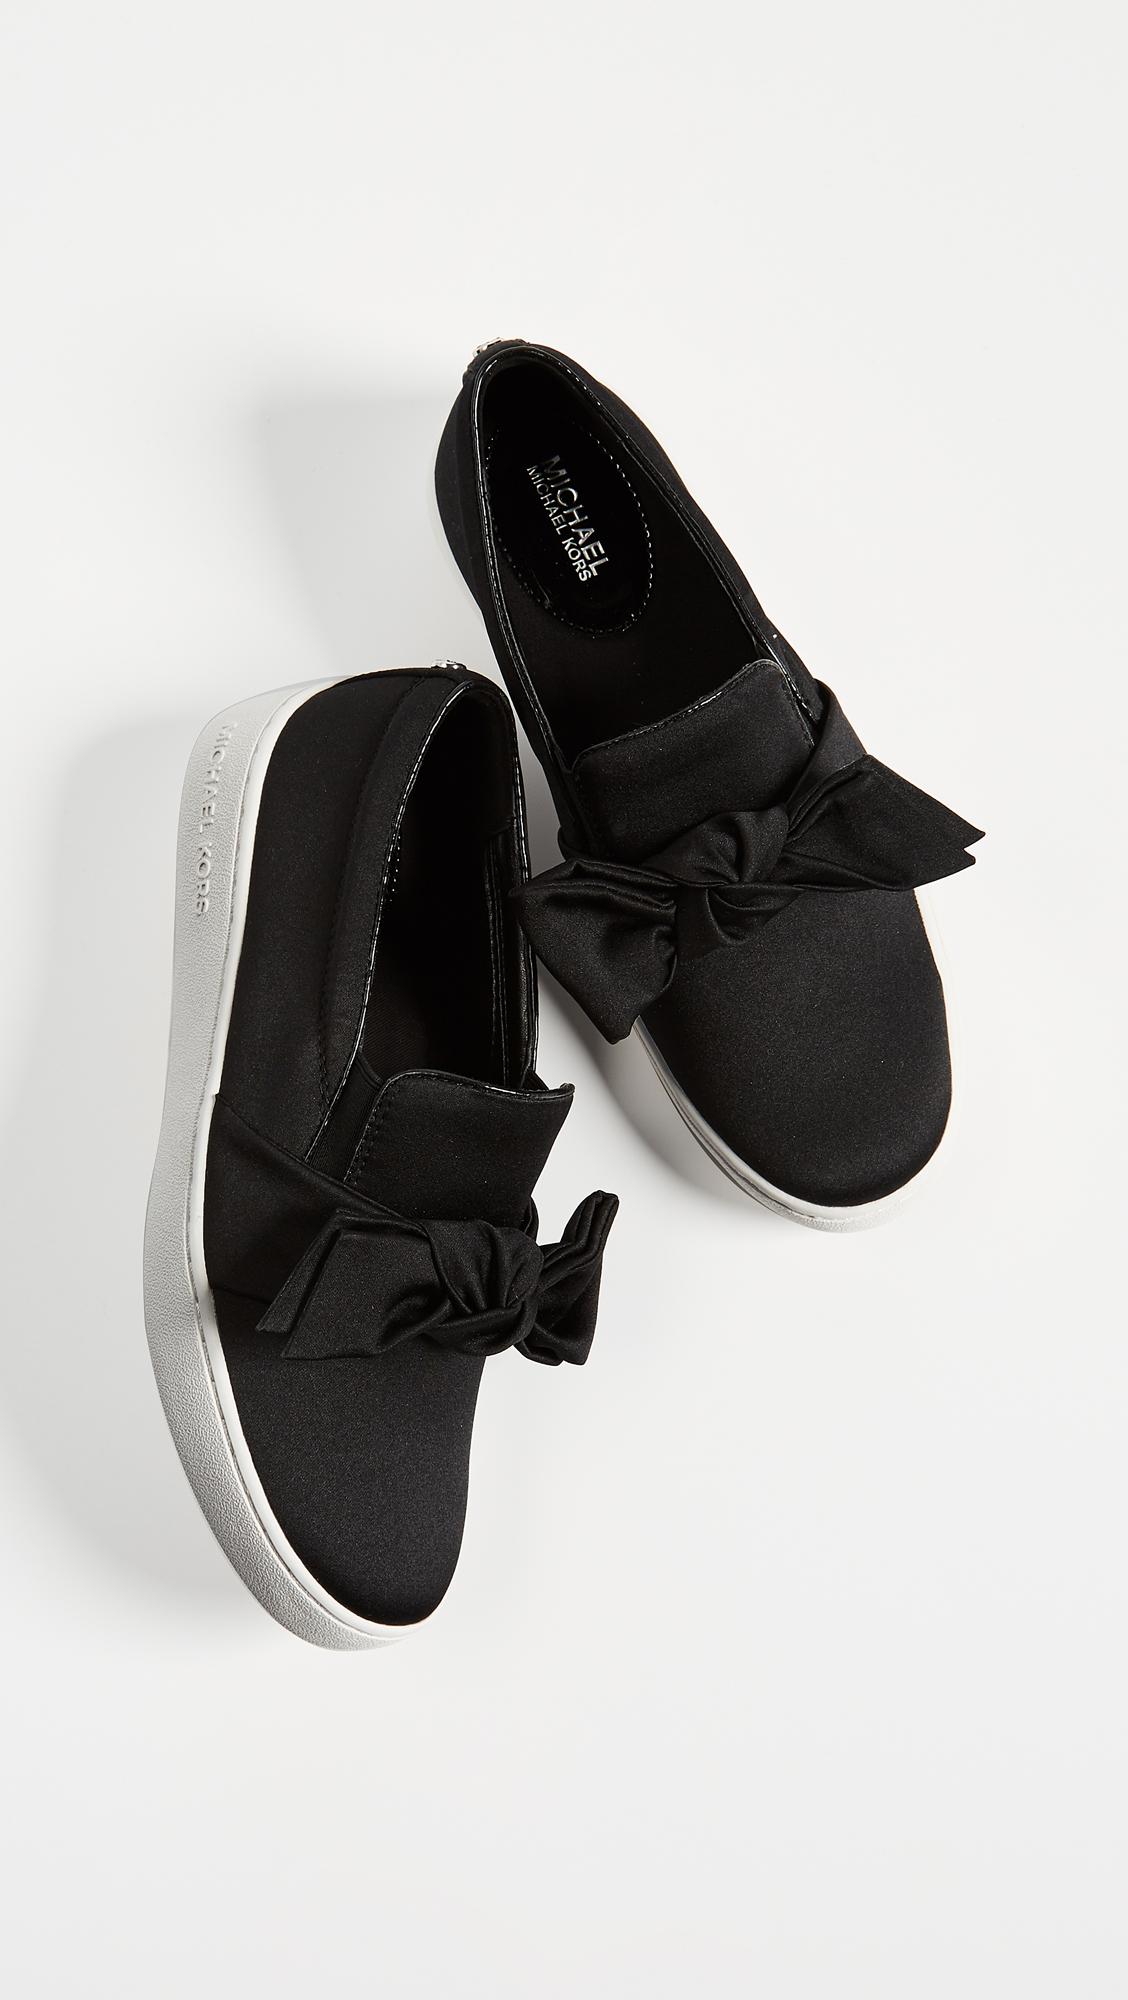 a67534fcfae98 MICHAEL Michael Kors Willa Slip On Sneakers